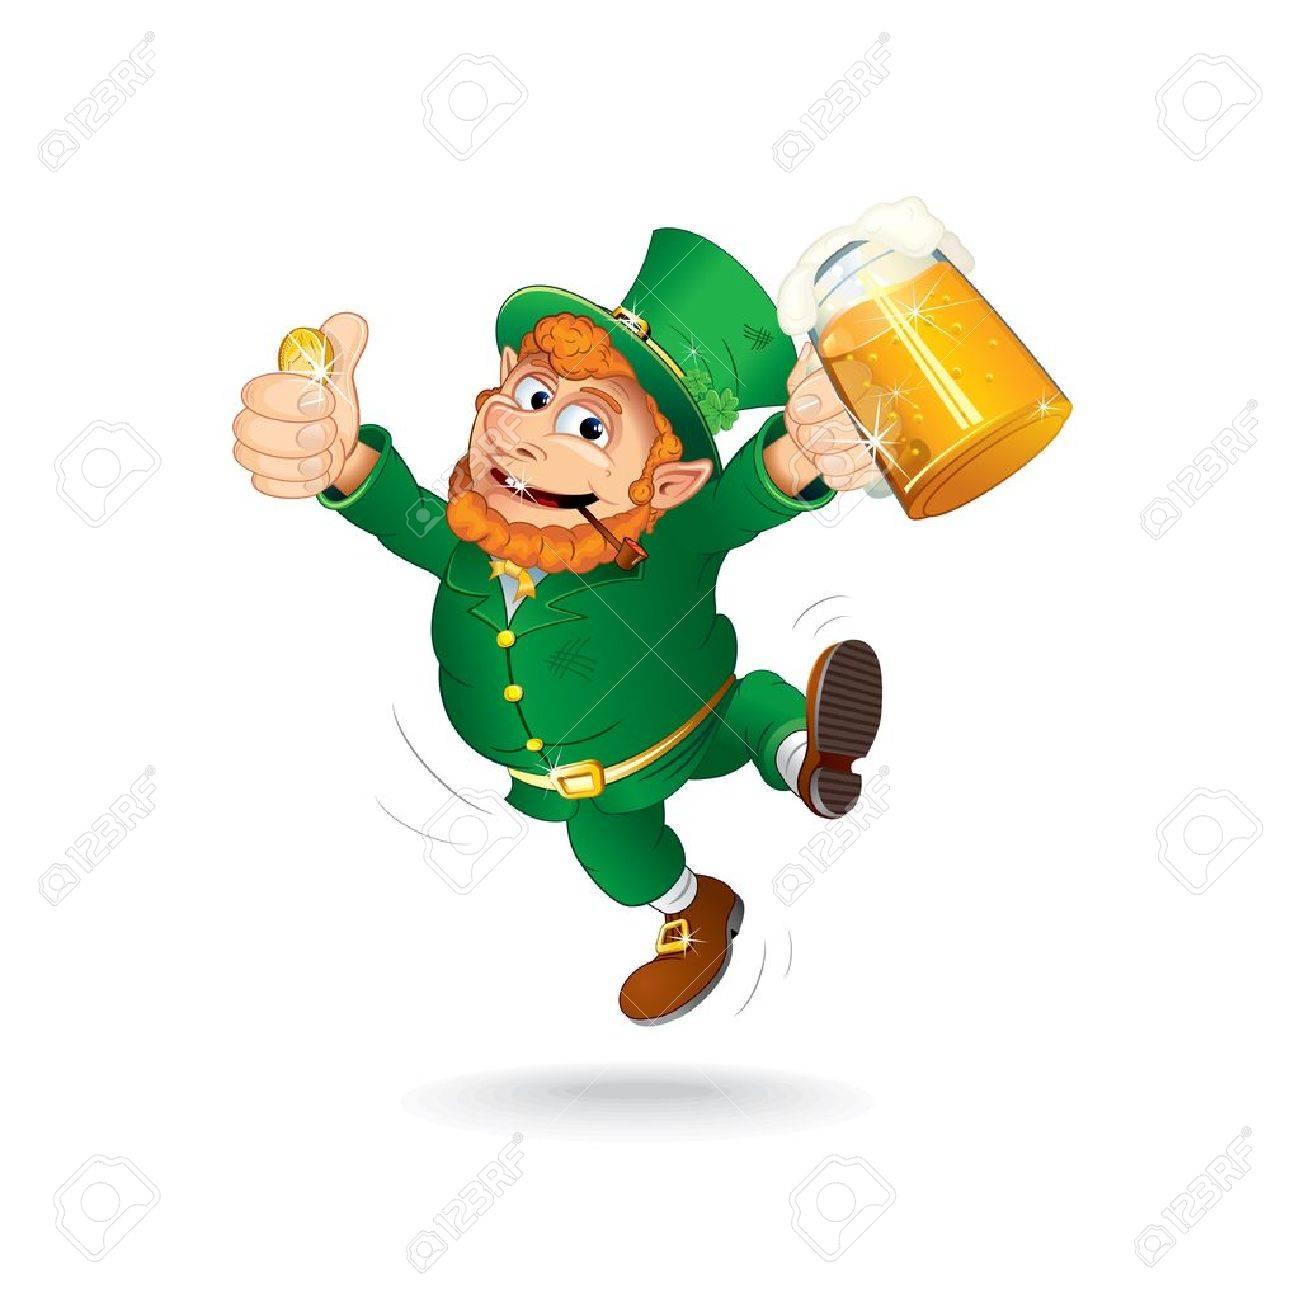 Uncategorized Are Leprechauns Irish cute jumping leprechaun isolated cartoon image royalty free stock vector 18002161